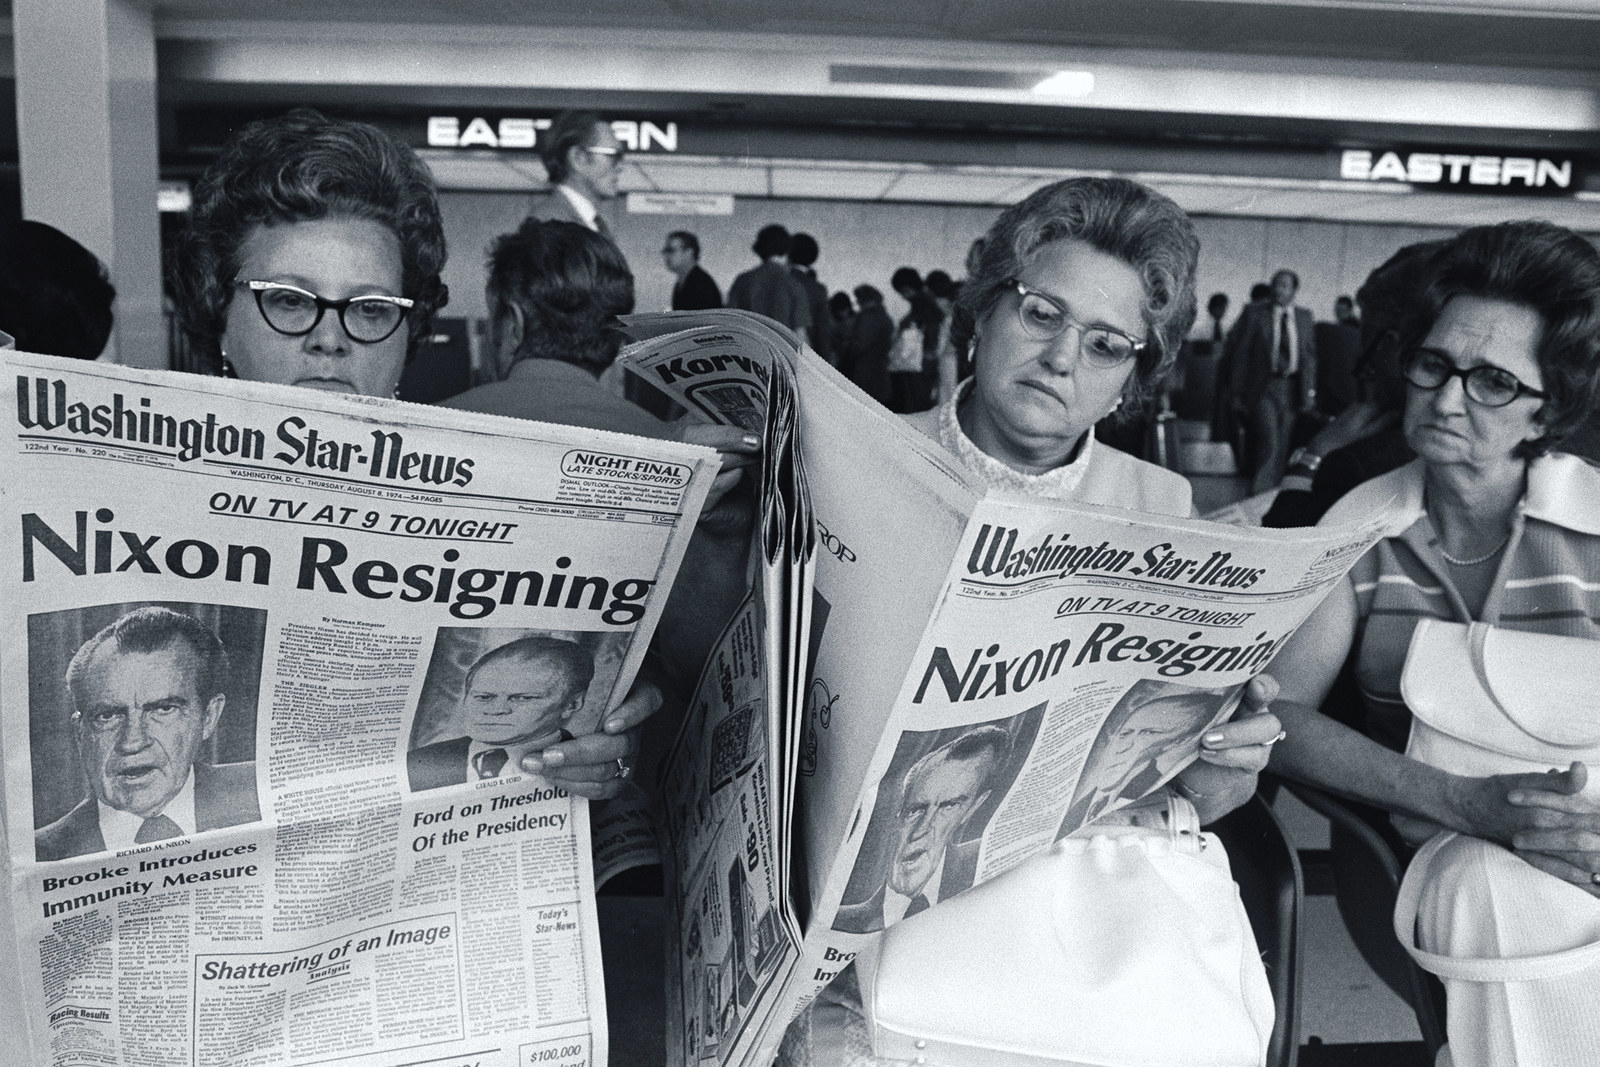 Women at Washington National Airport read copies of the Washington Star-News newspaper.